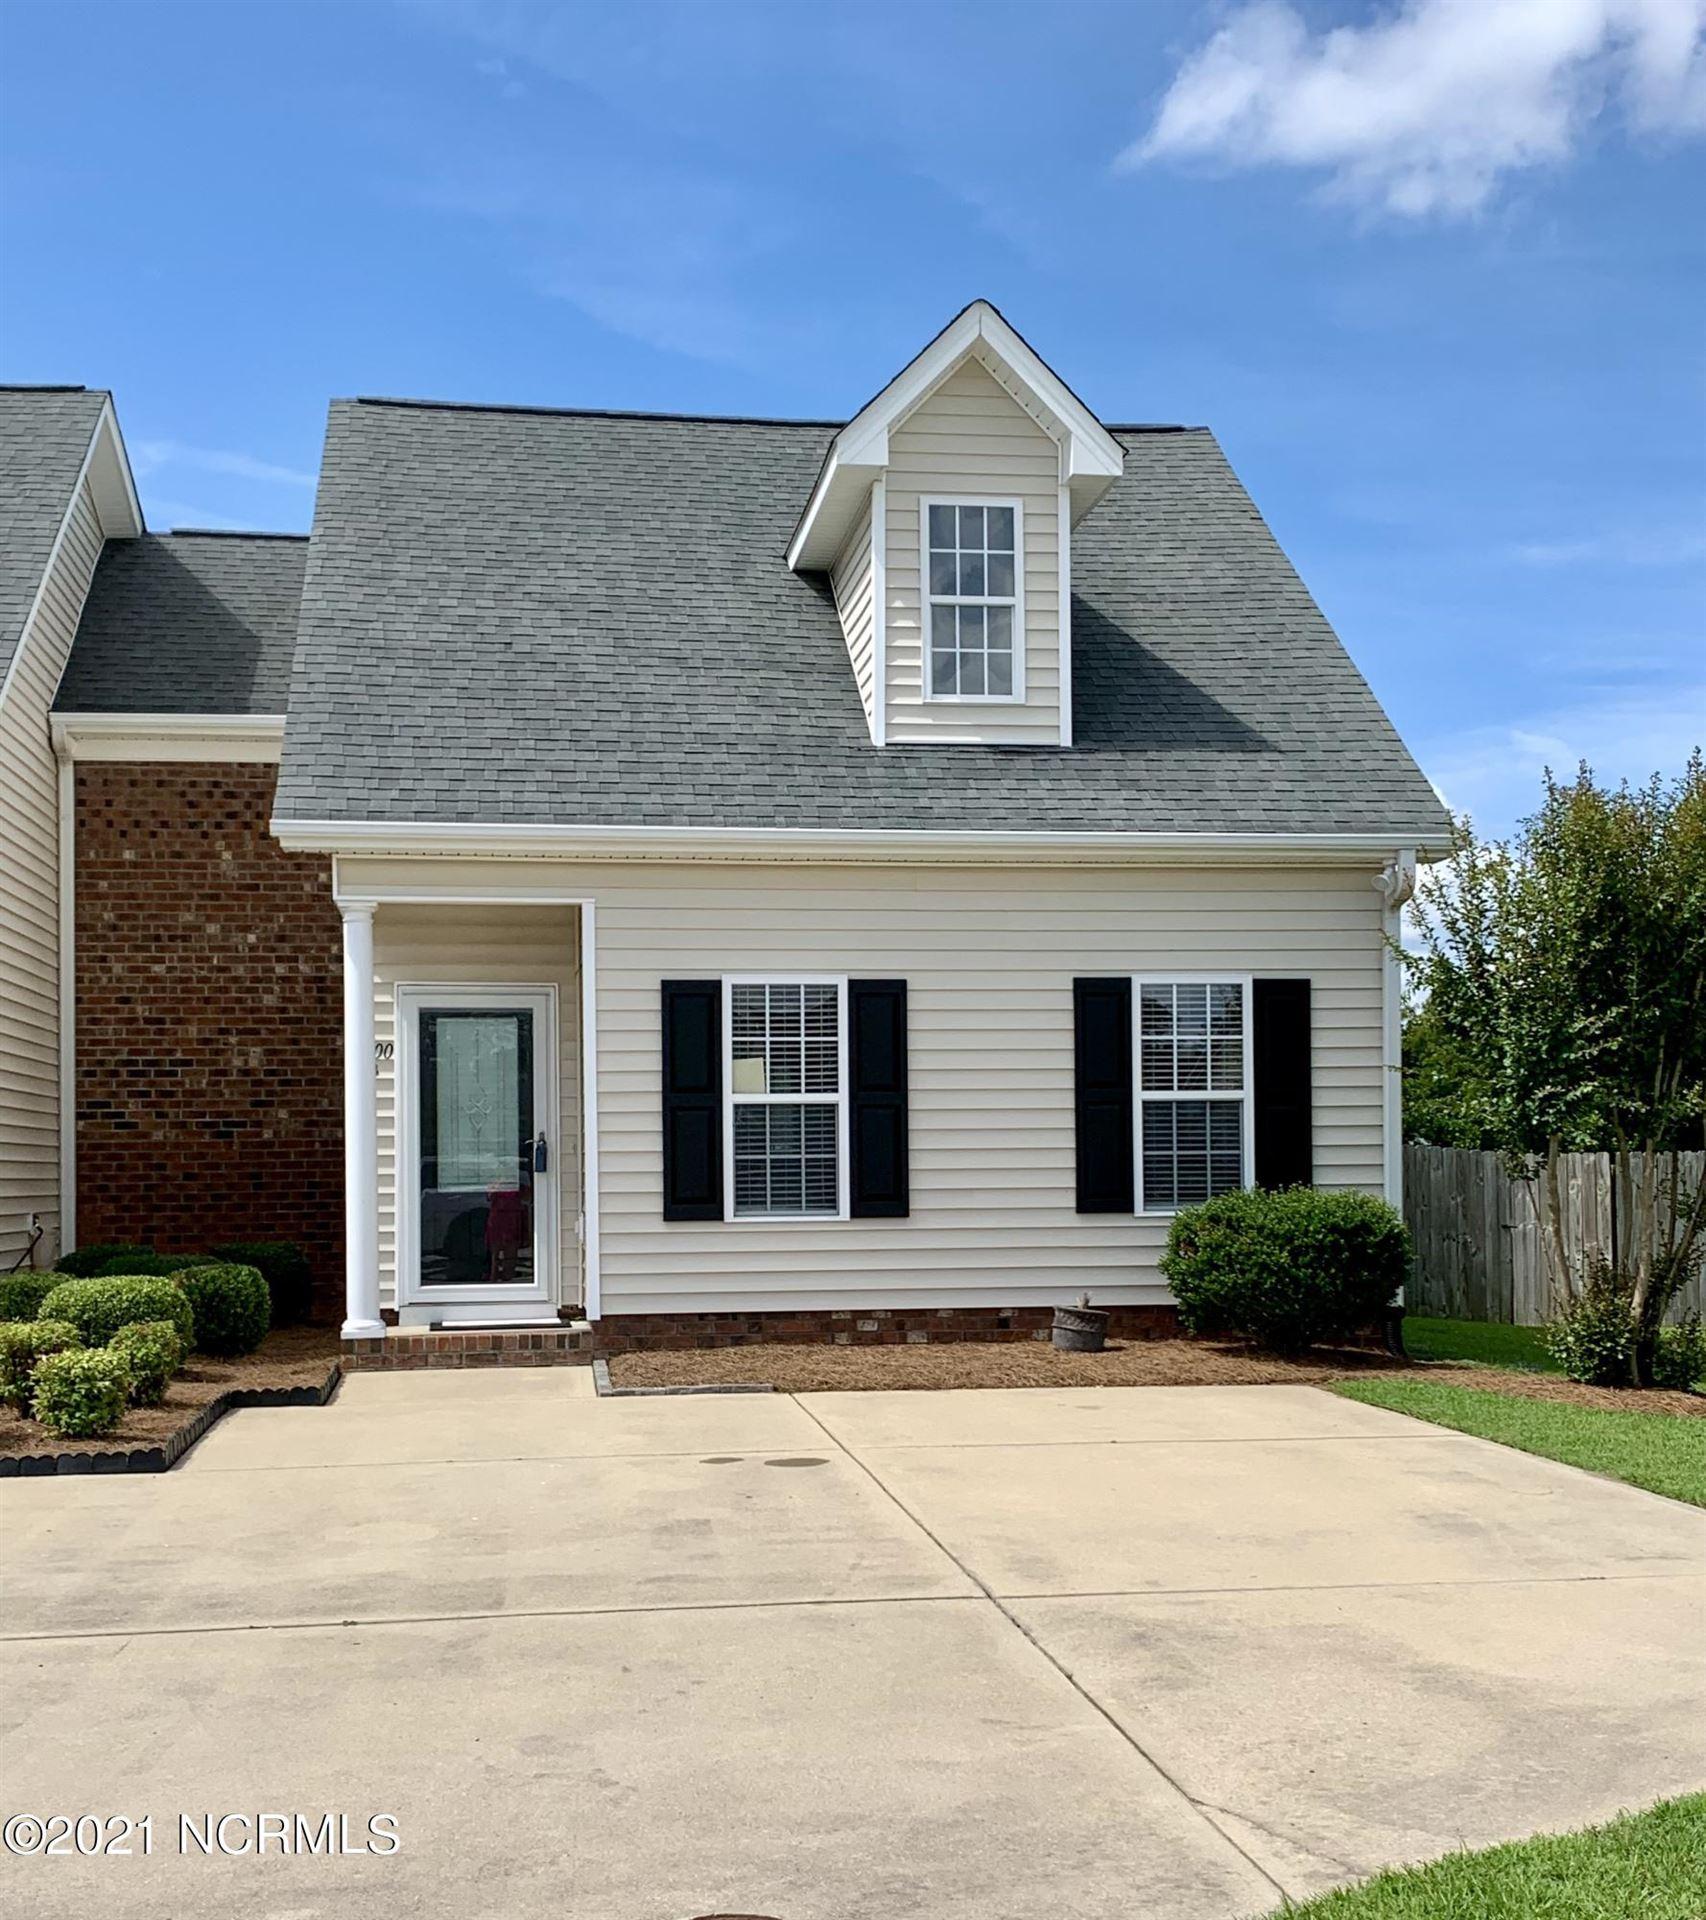 Photo for 1400 Oak Ridge Court #B, Greenville, NC 27834 (MLS # 100275553)